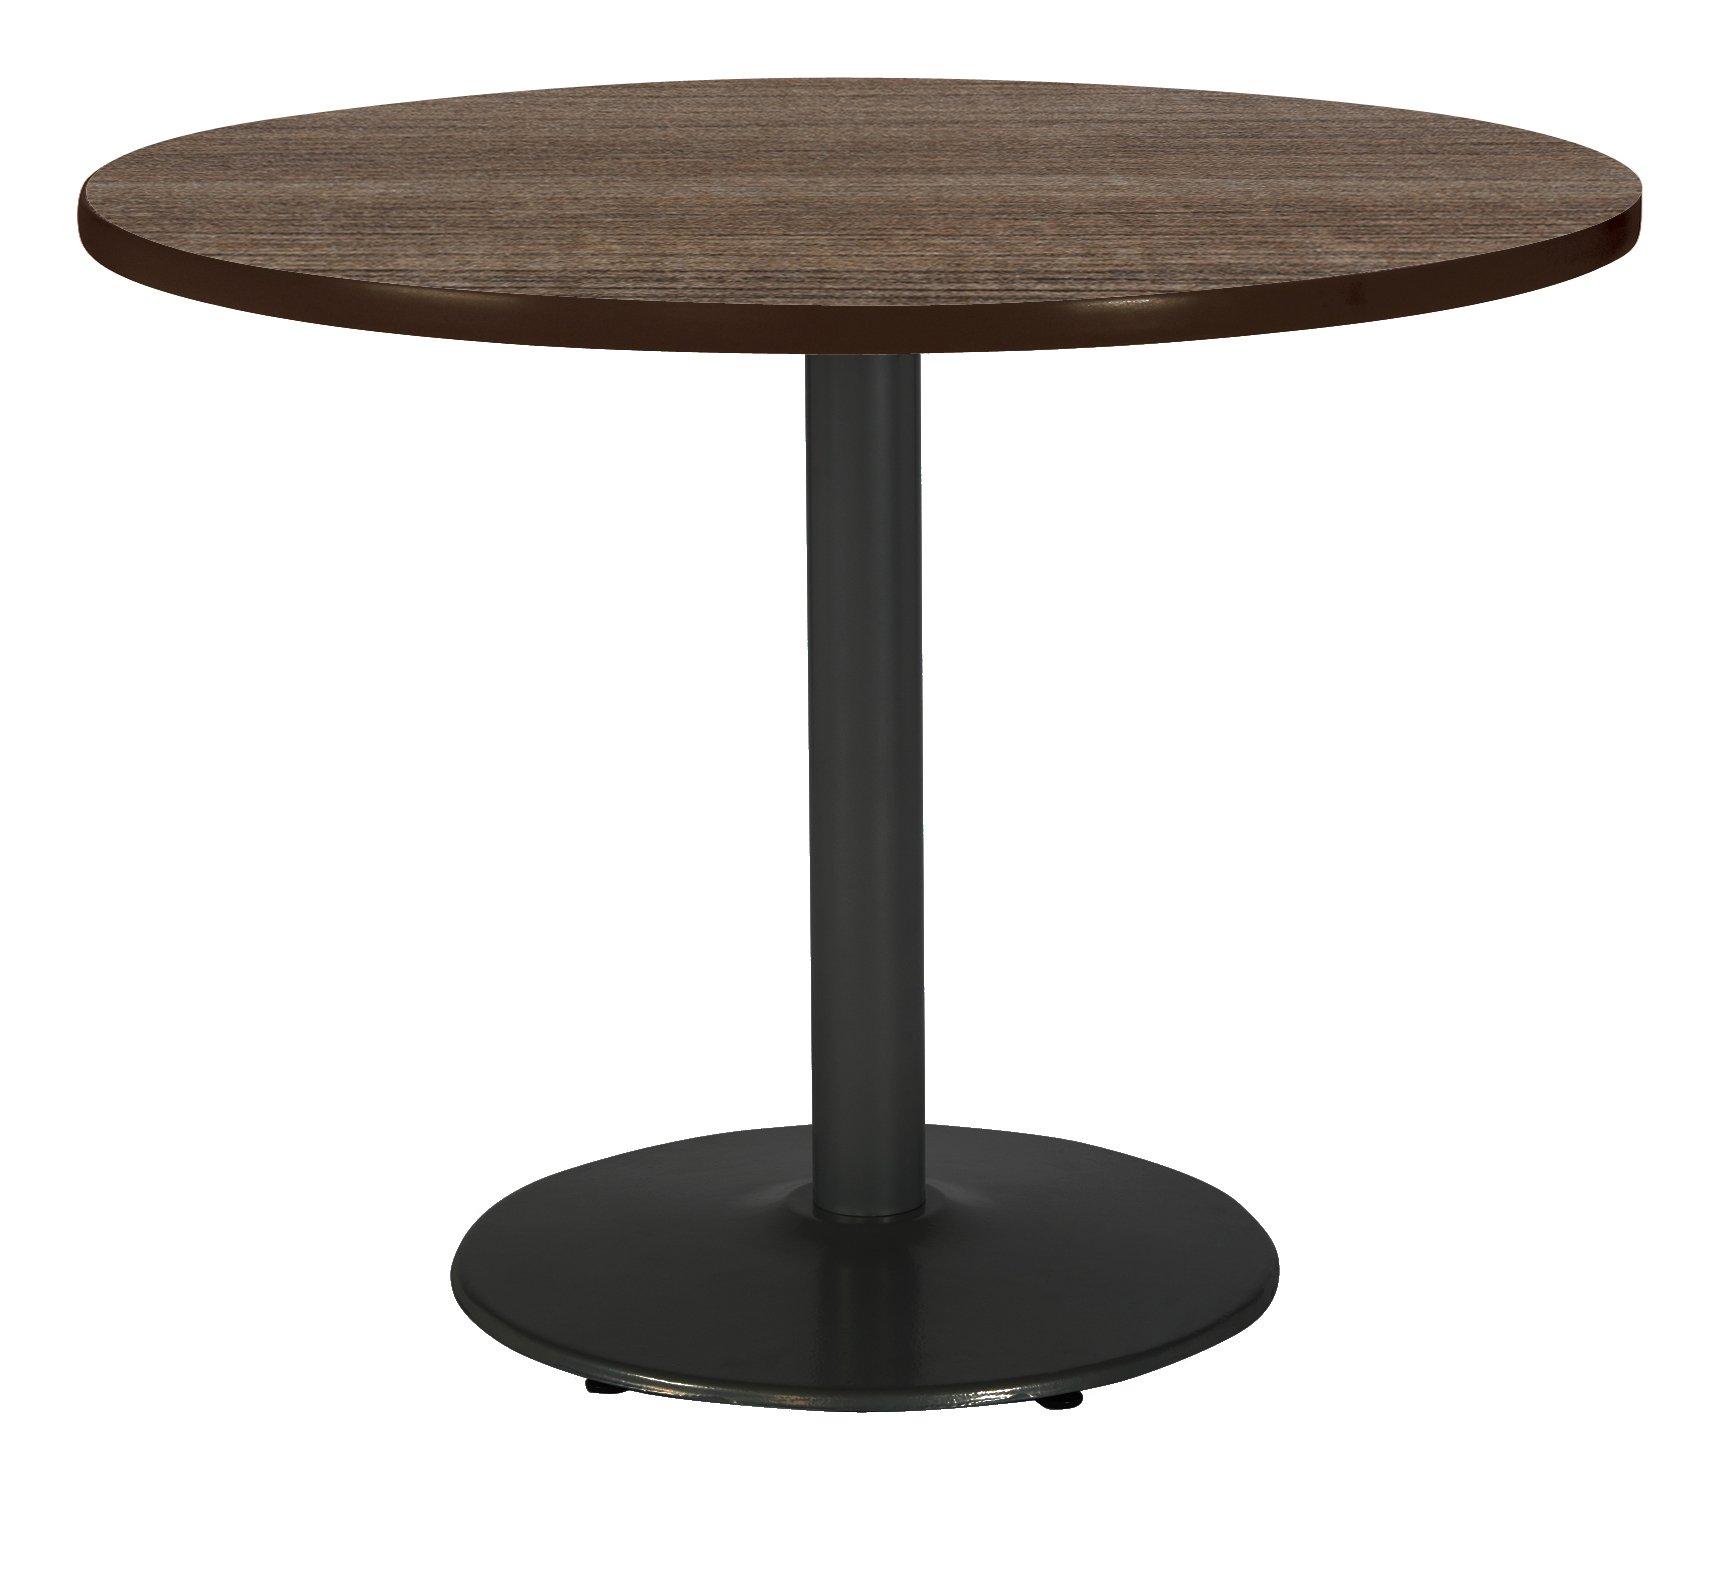 KFI Seating T48RD-B1930-BK-7960K Mode Multipurpose Table 48'' Round Top Studio Teak